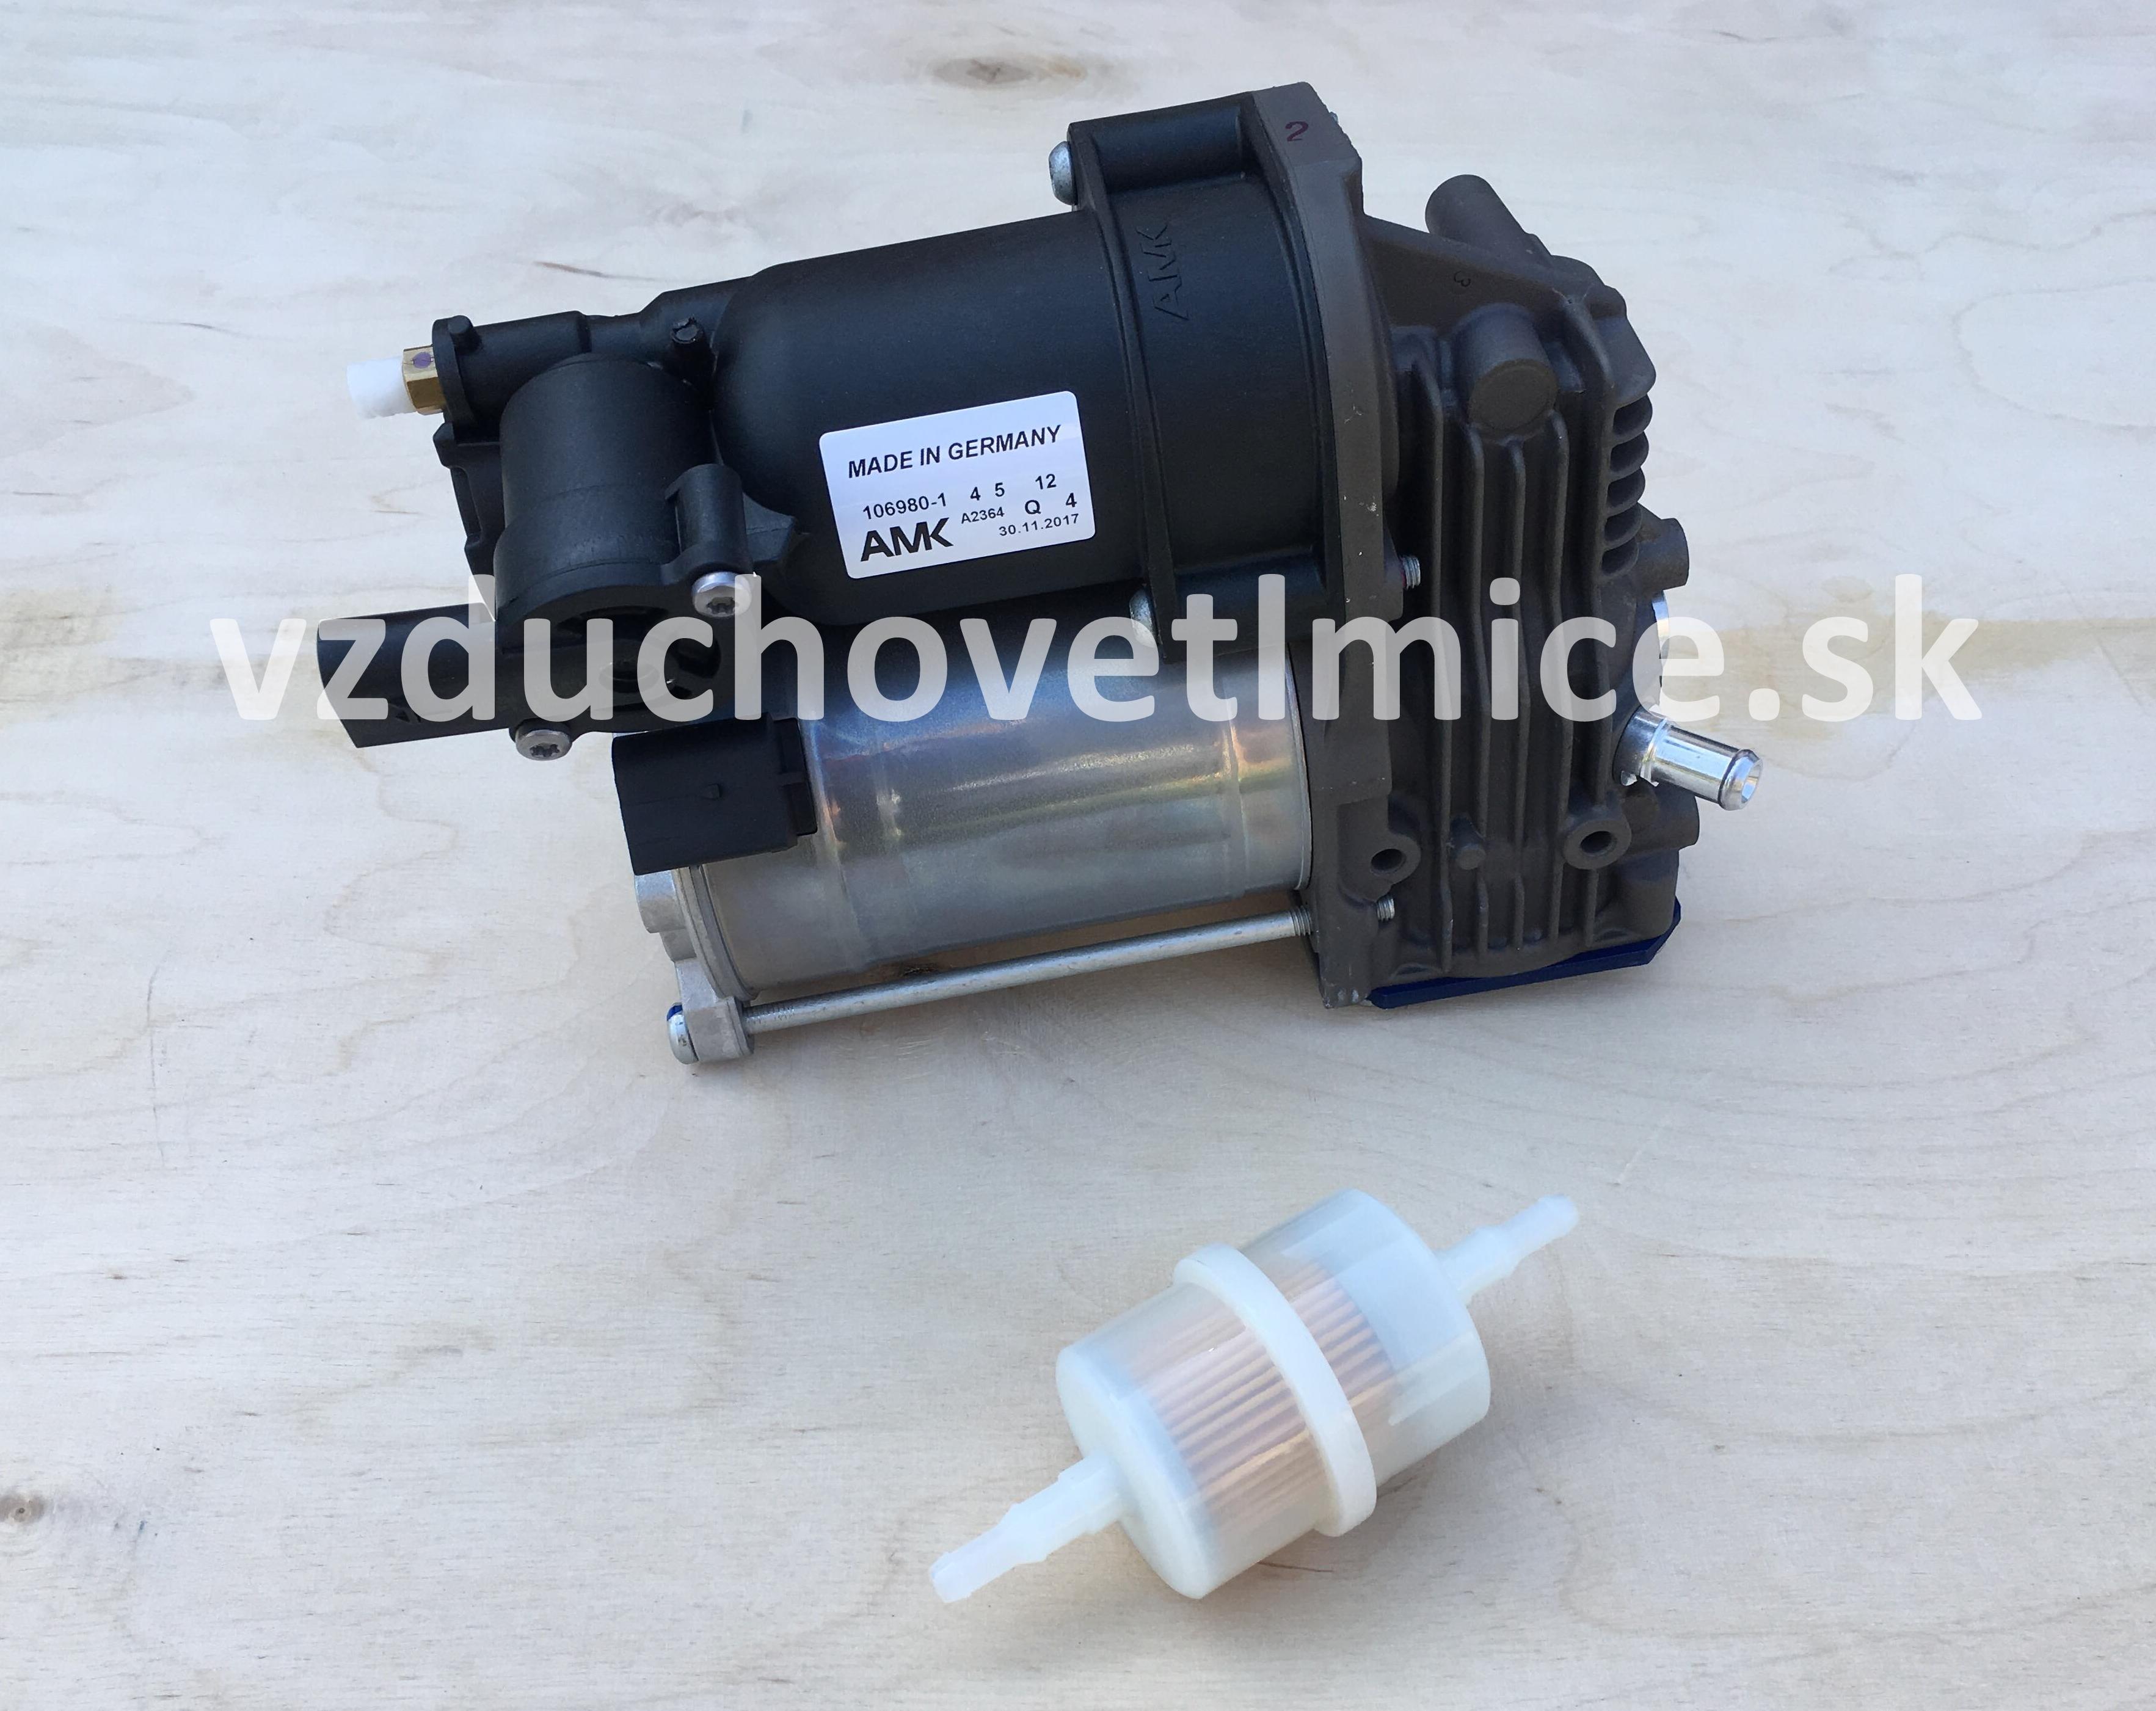 Vzduchový kompresor podvozku AMK Mercedes Benz Vito/Viano-class W639